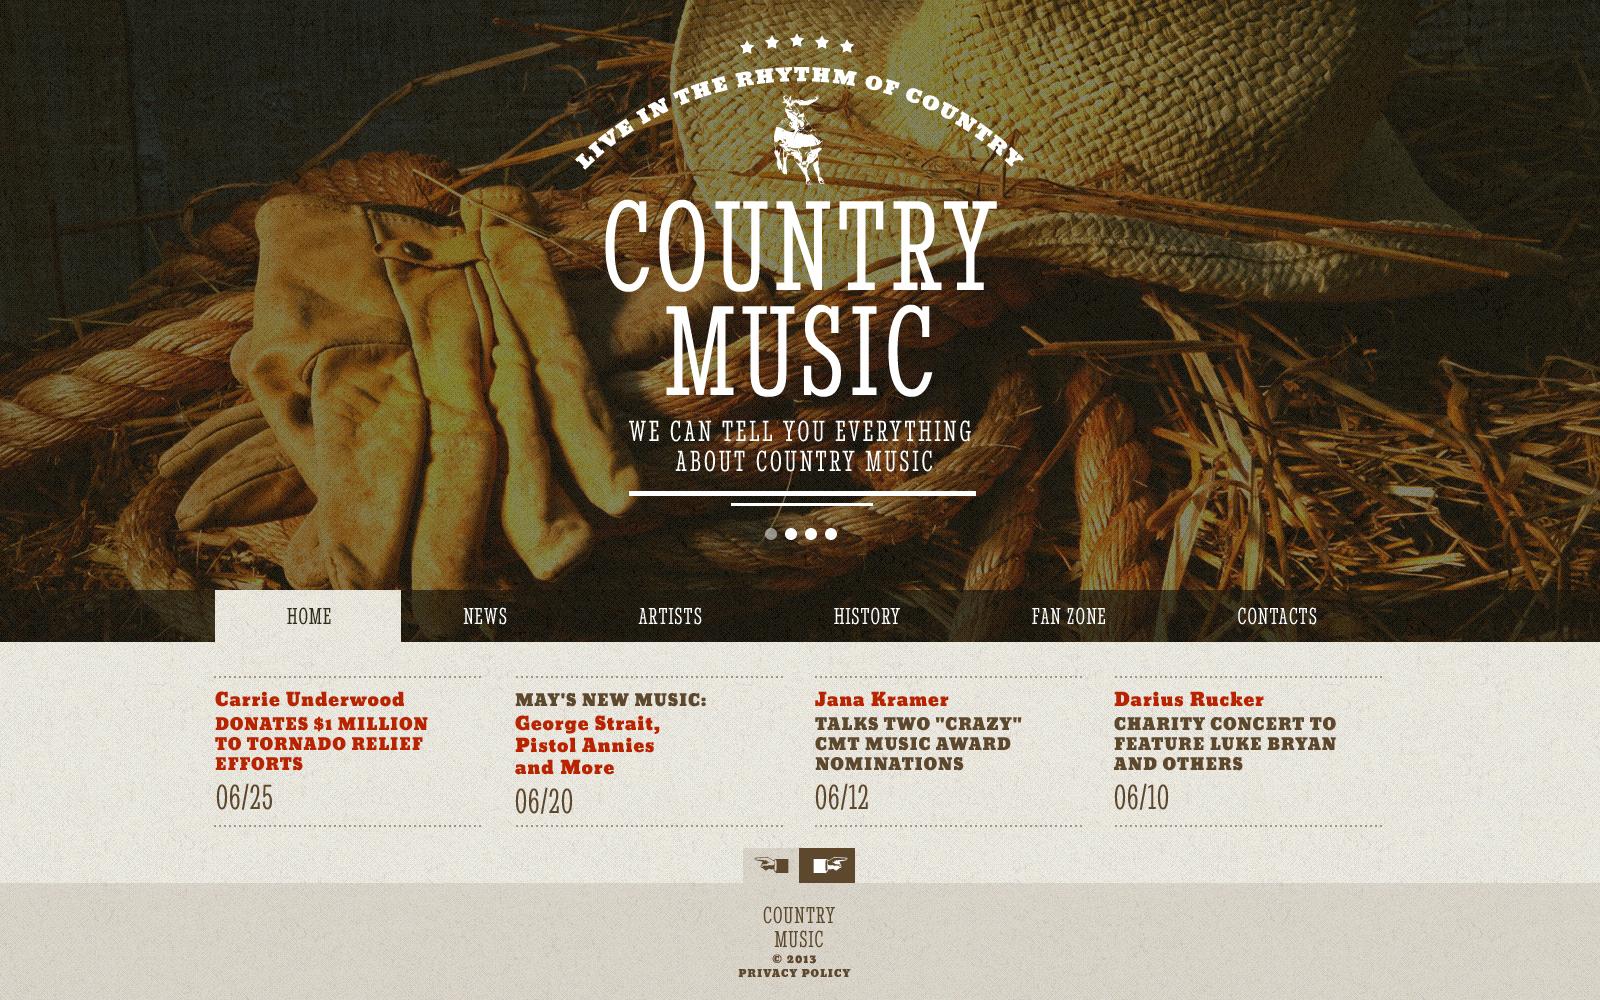 Bootstrap Шаблон сайту на тему музична група №45846 - скріншот